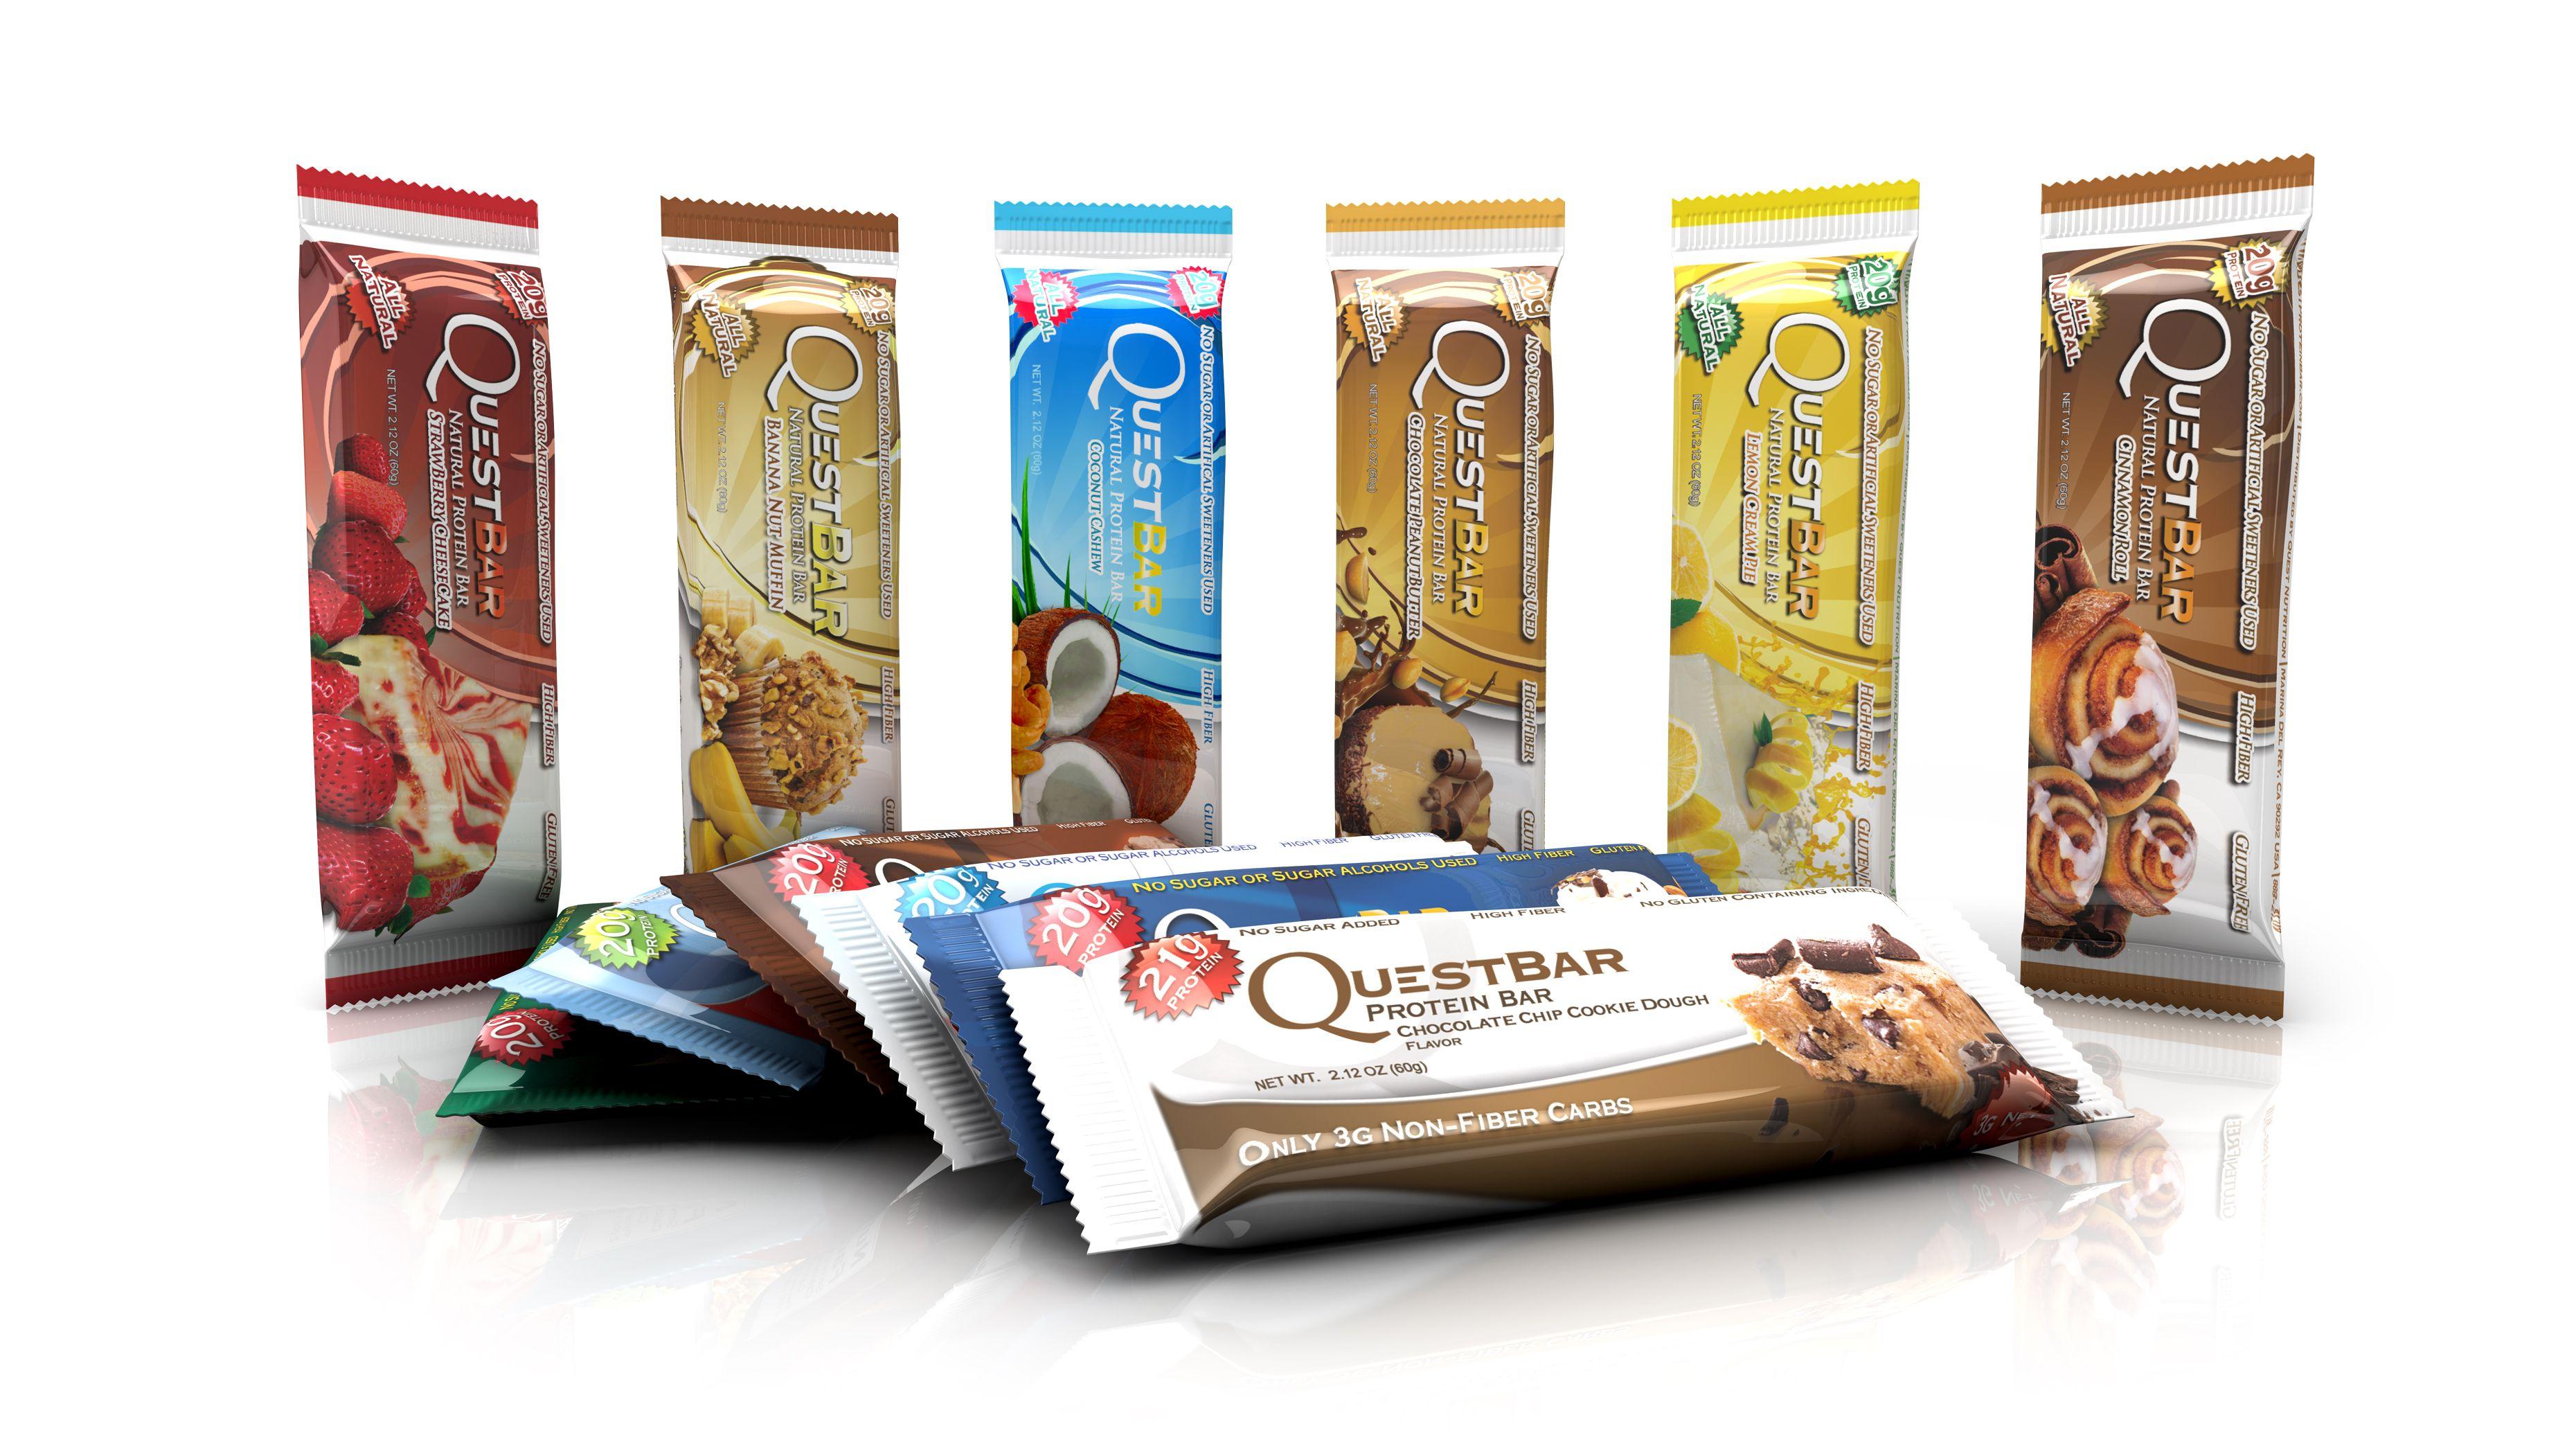 Quest bar proteínová tyčinka